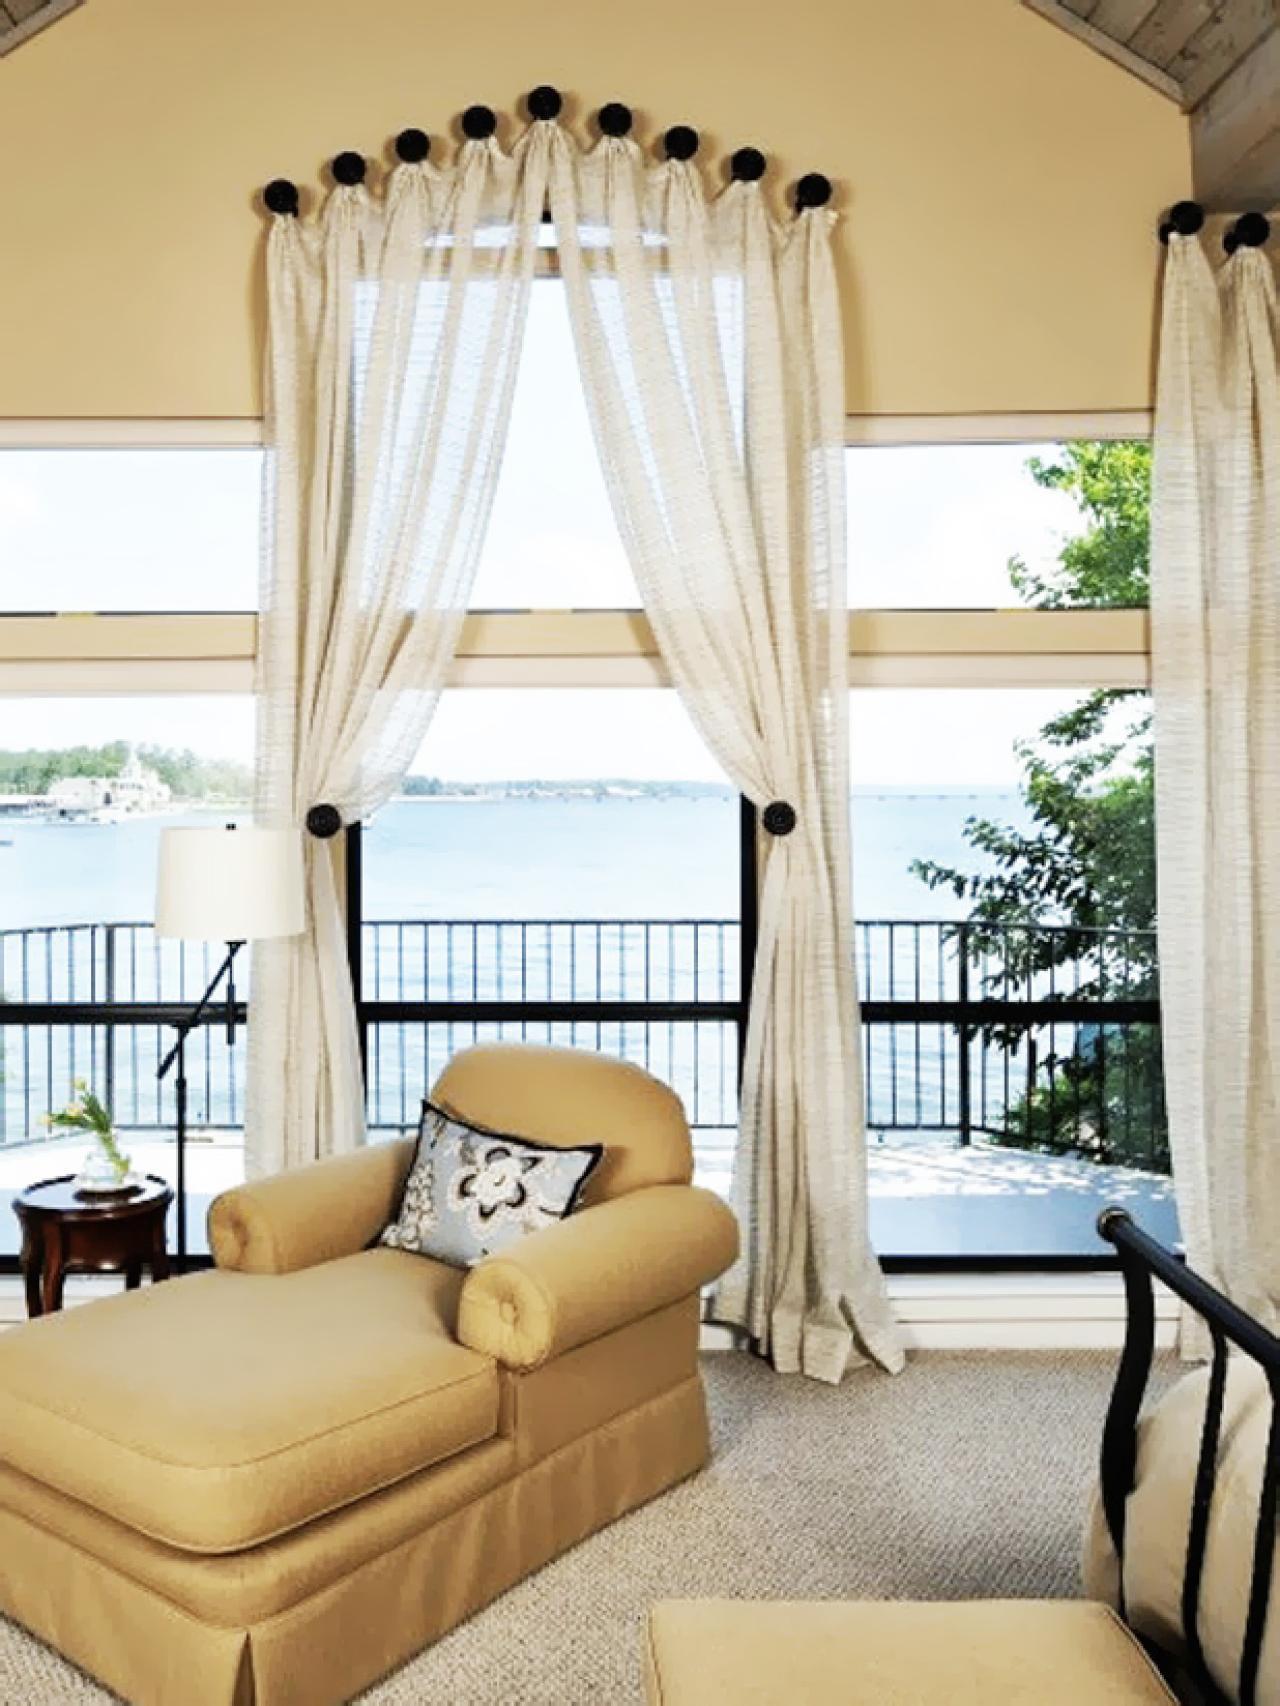 original_carla-aston-værelses-windows_s3x4-jpg-rend-hgtvcom-1280-1707